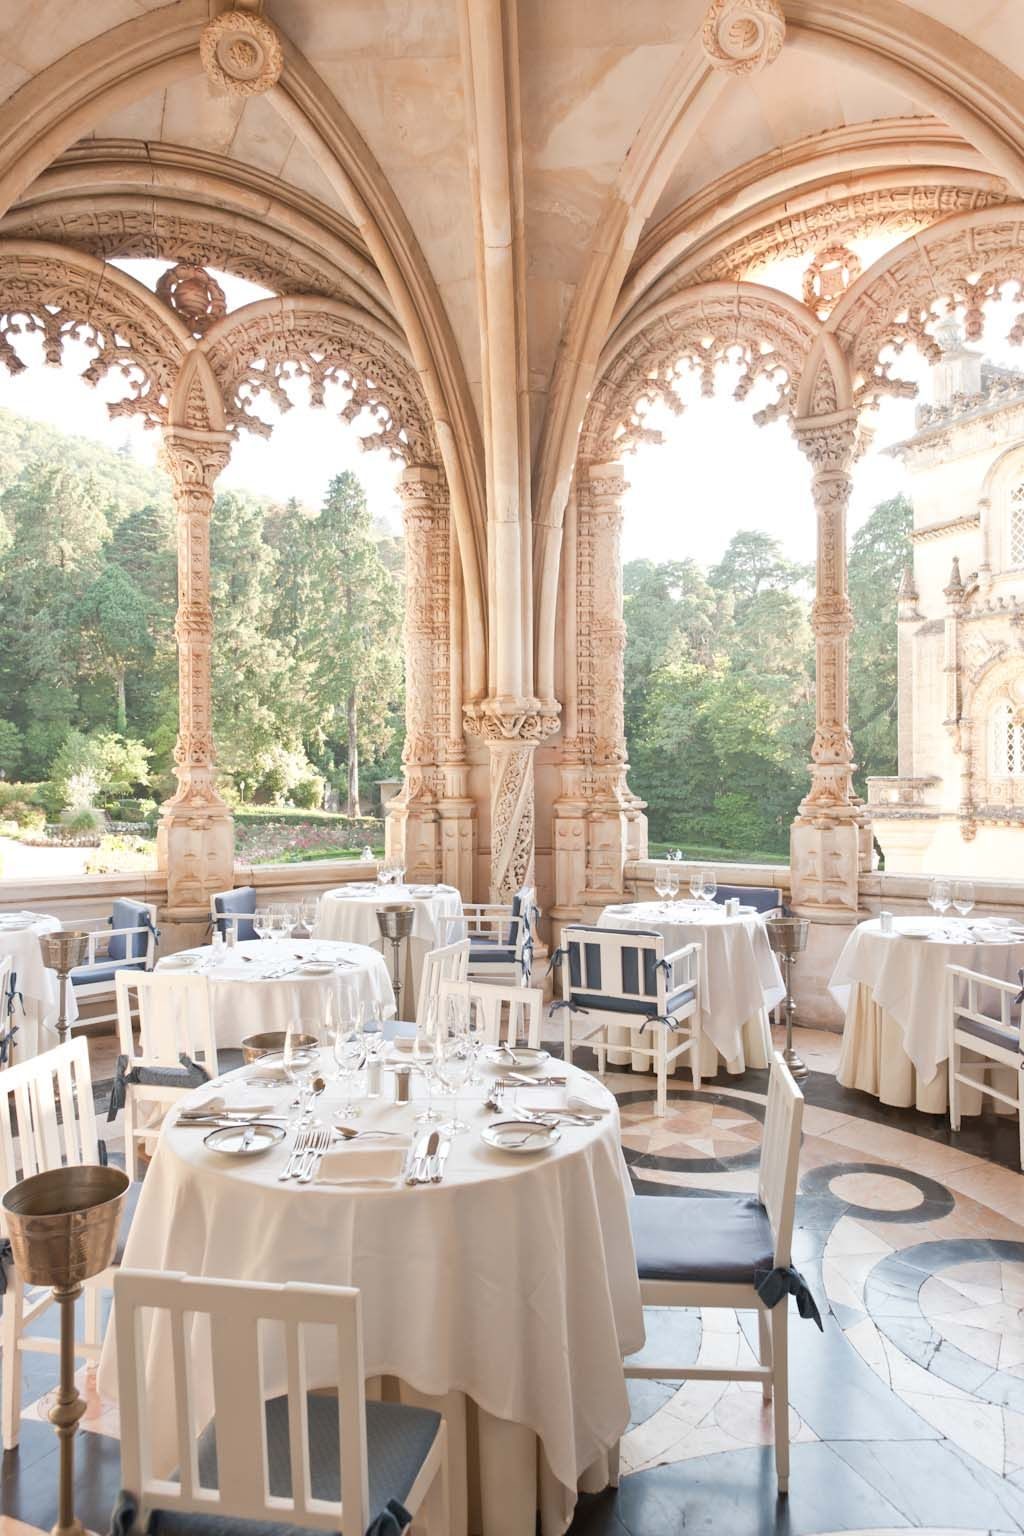 Hotel Palace do Buçaco, Portugal – Eating outside